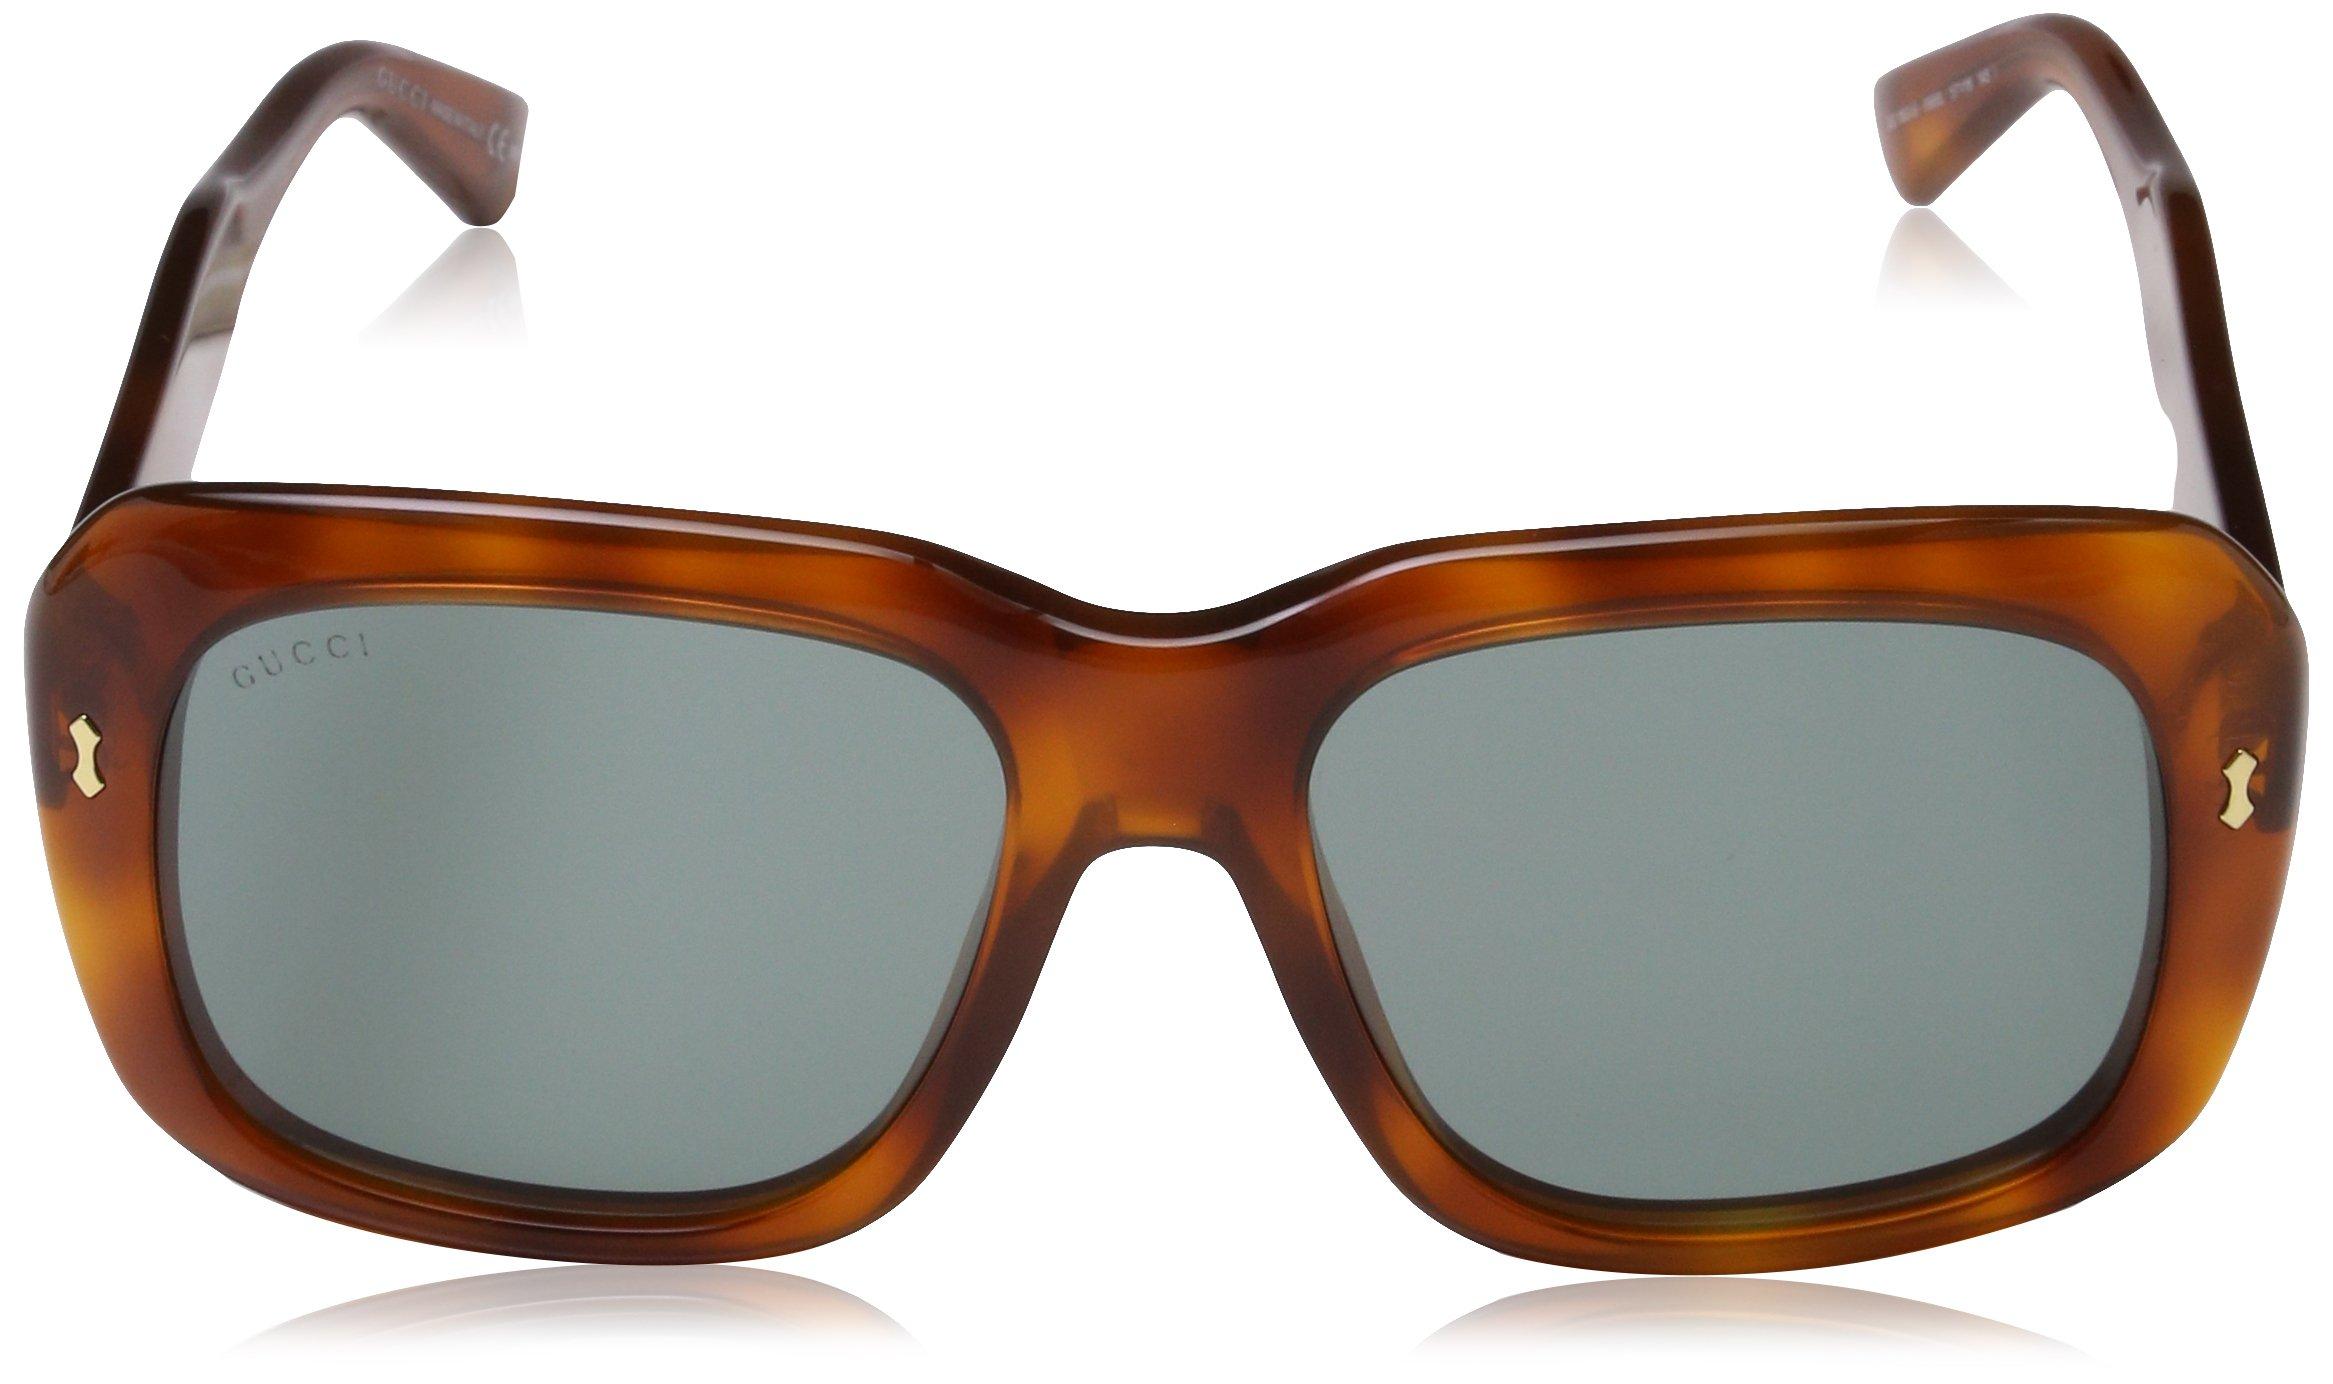 Gucci Men's GG 2247/S Semi Matte Black/Gradient Shaded Polarized by Gucci (Image #2)